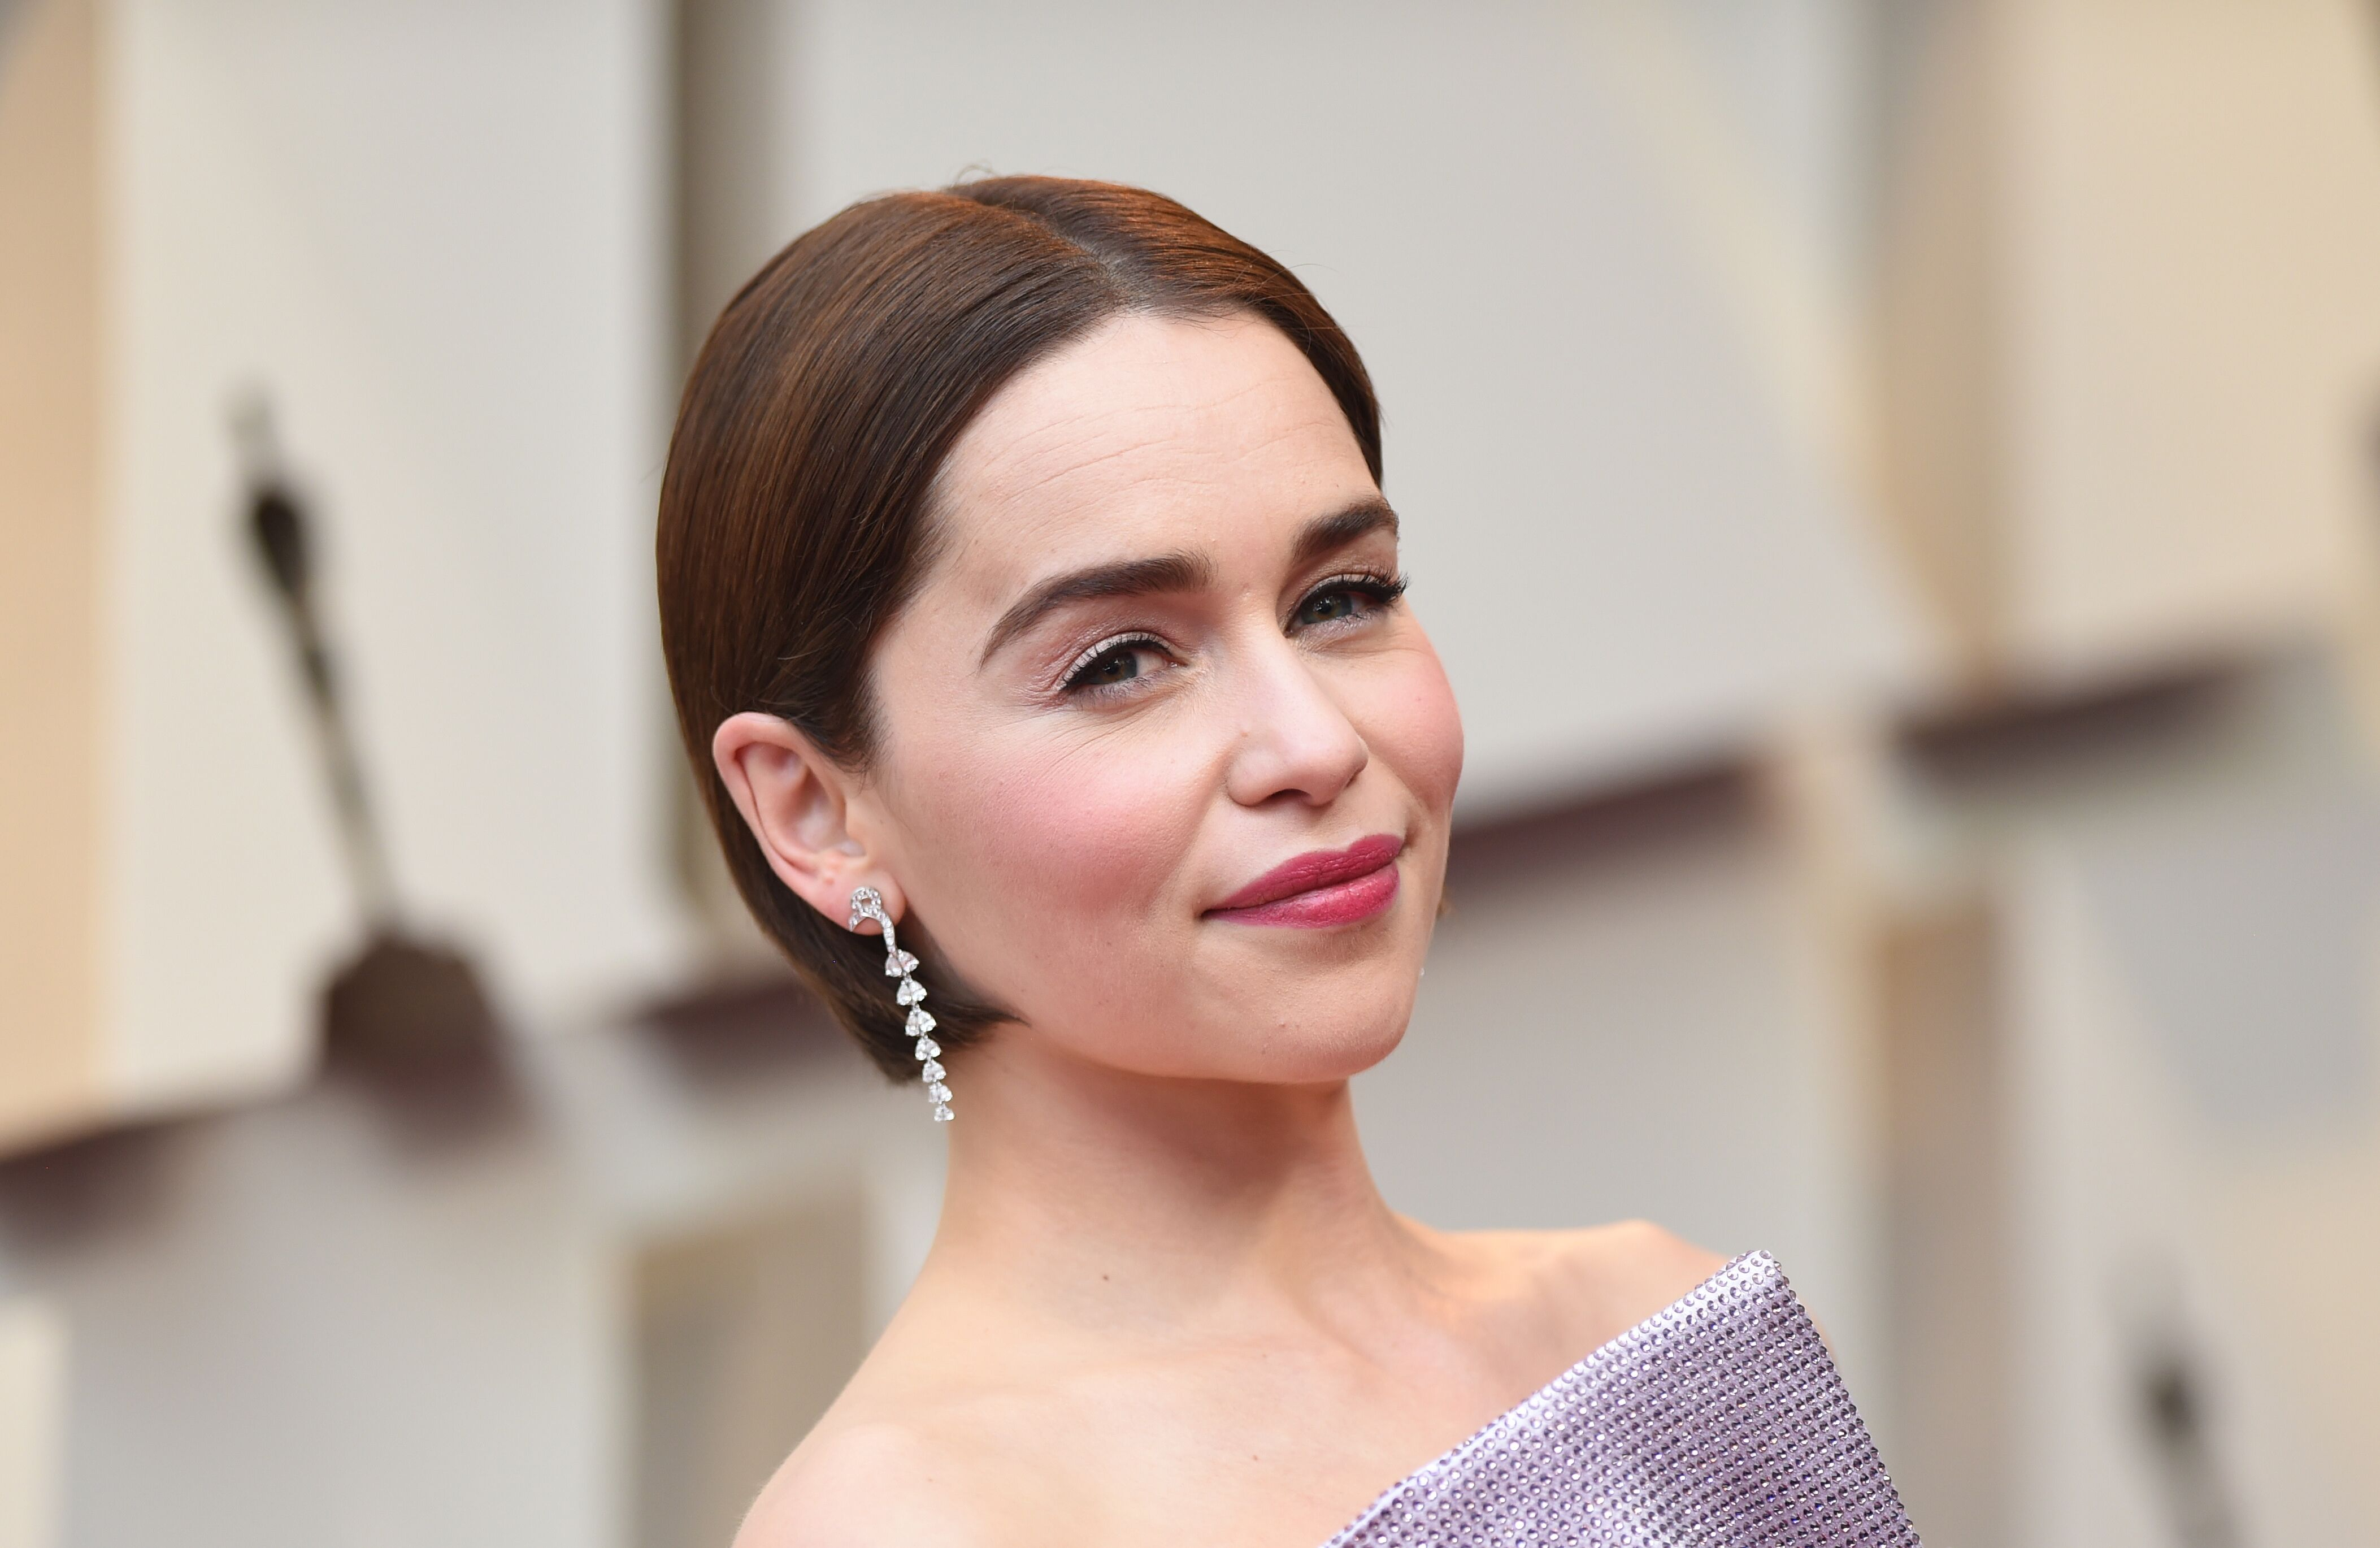 Emilia Clarke victime de deux AVC : la star de Game of Thrones raconte son calvaire